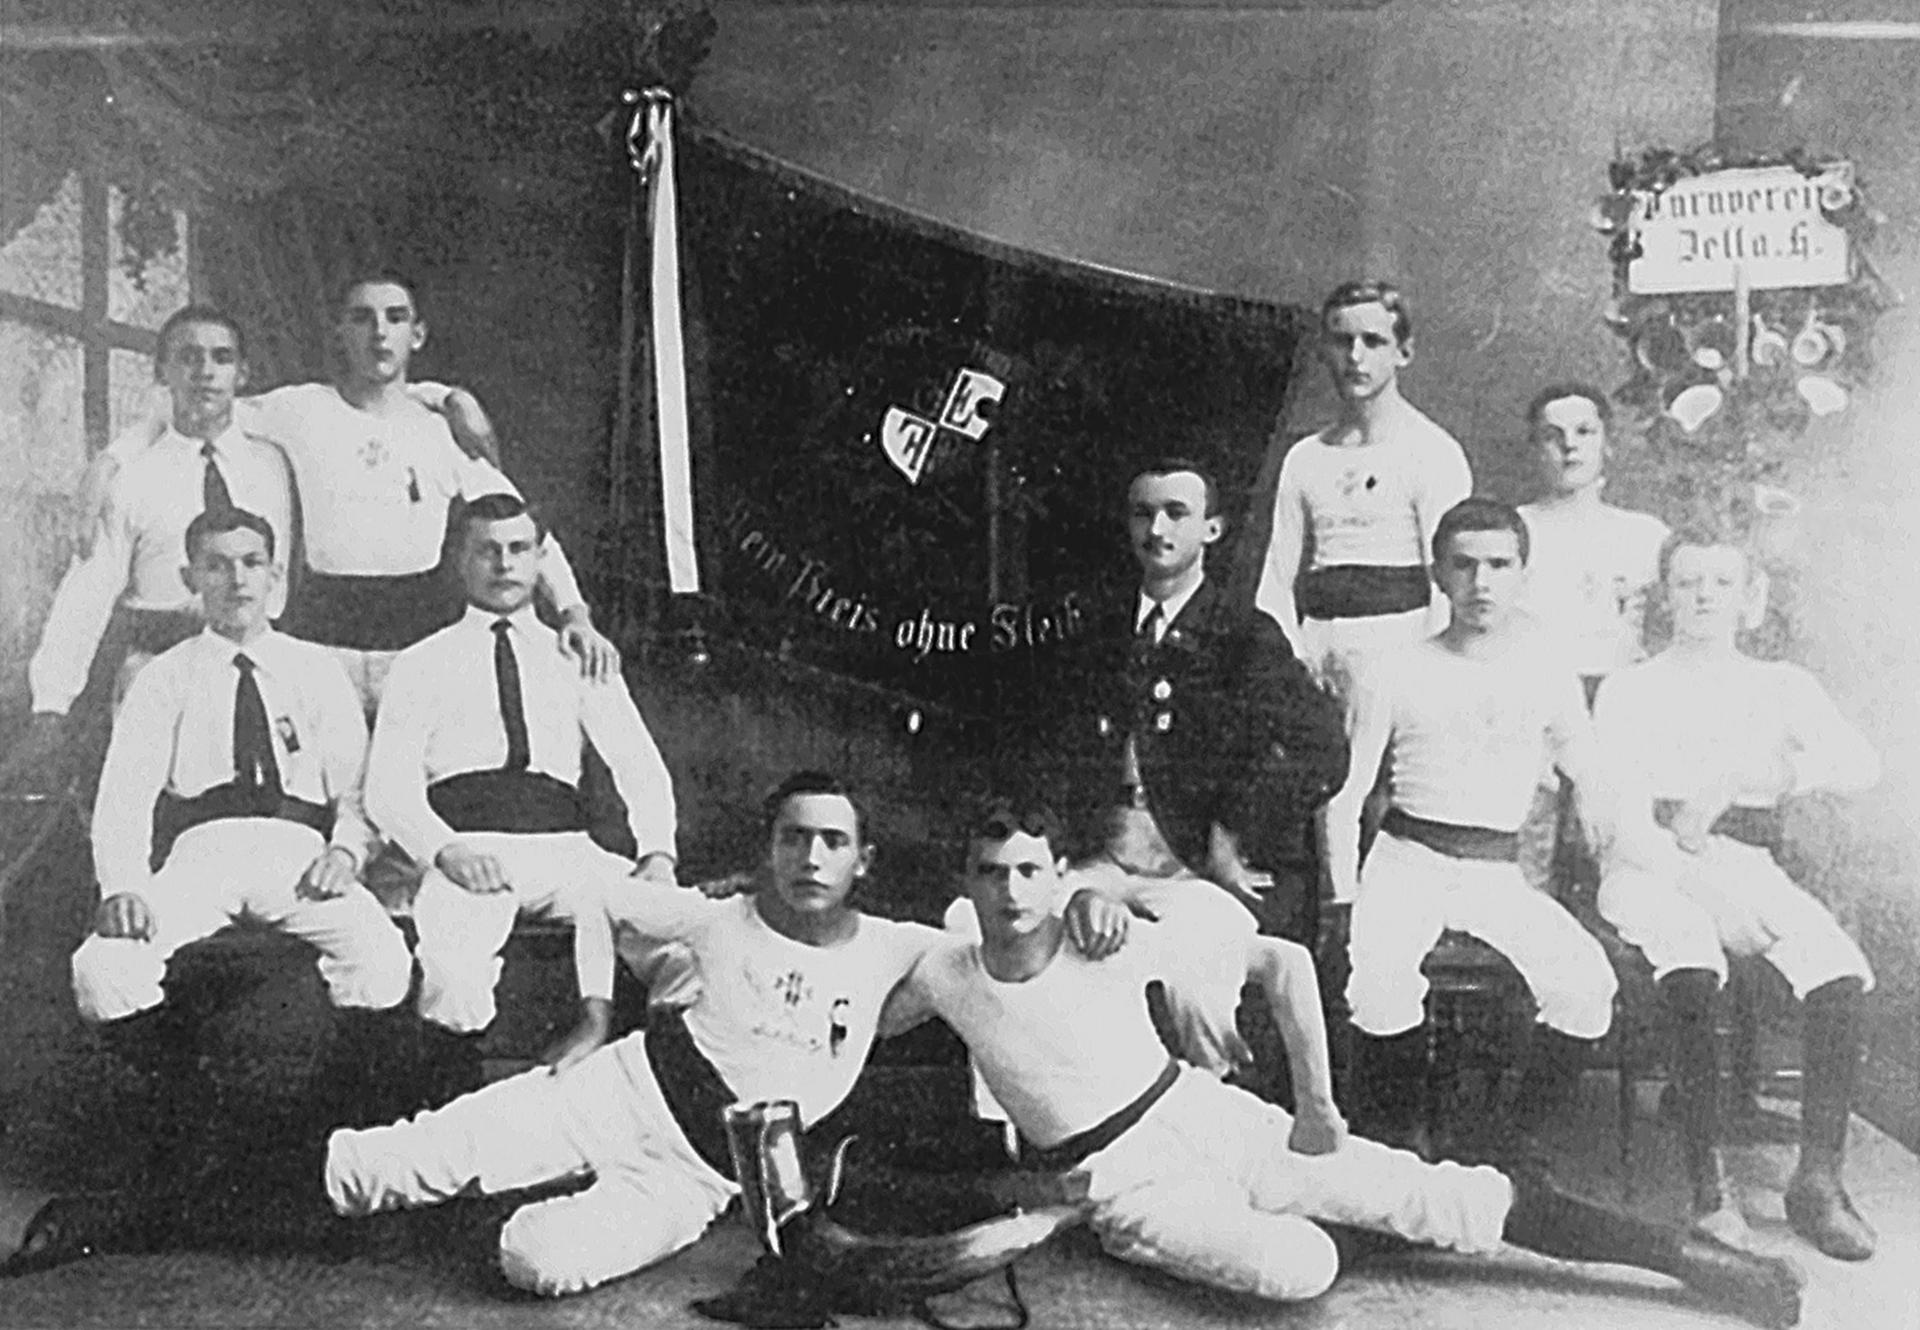 1903 Stiftungsfest